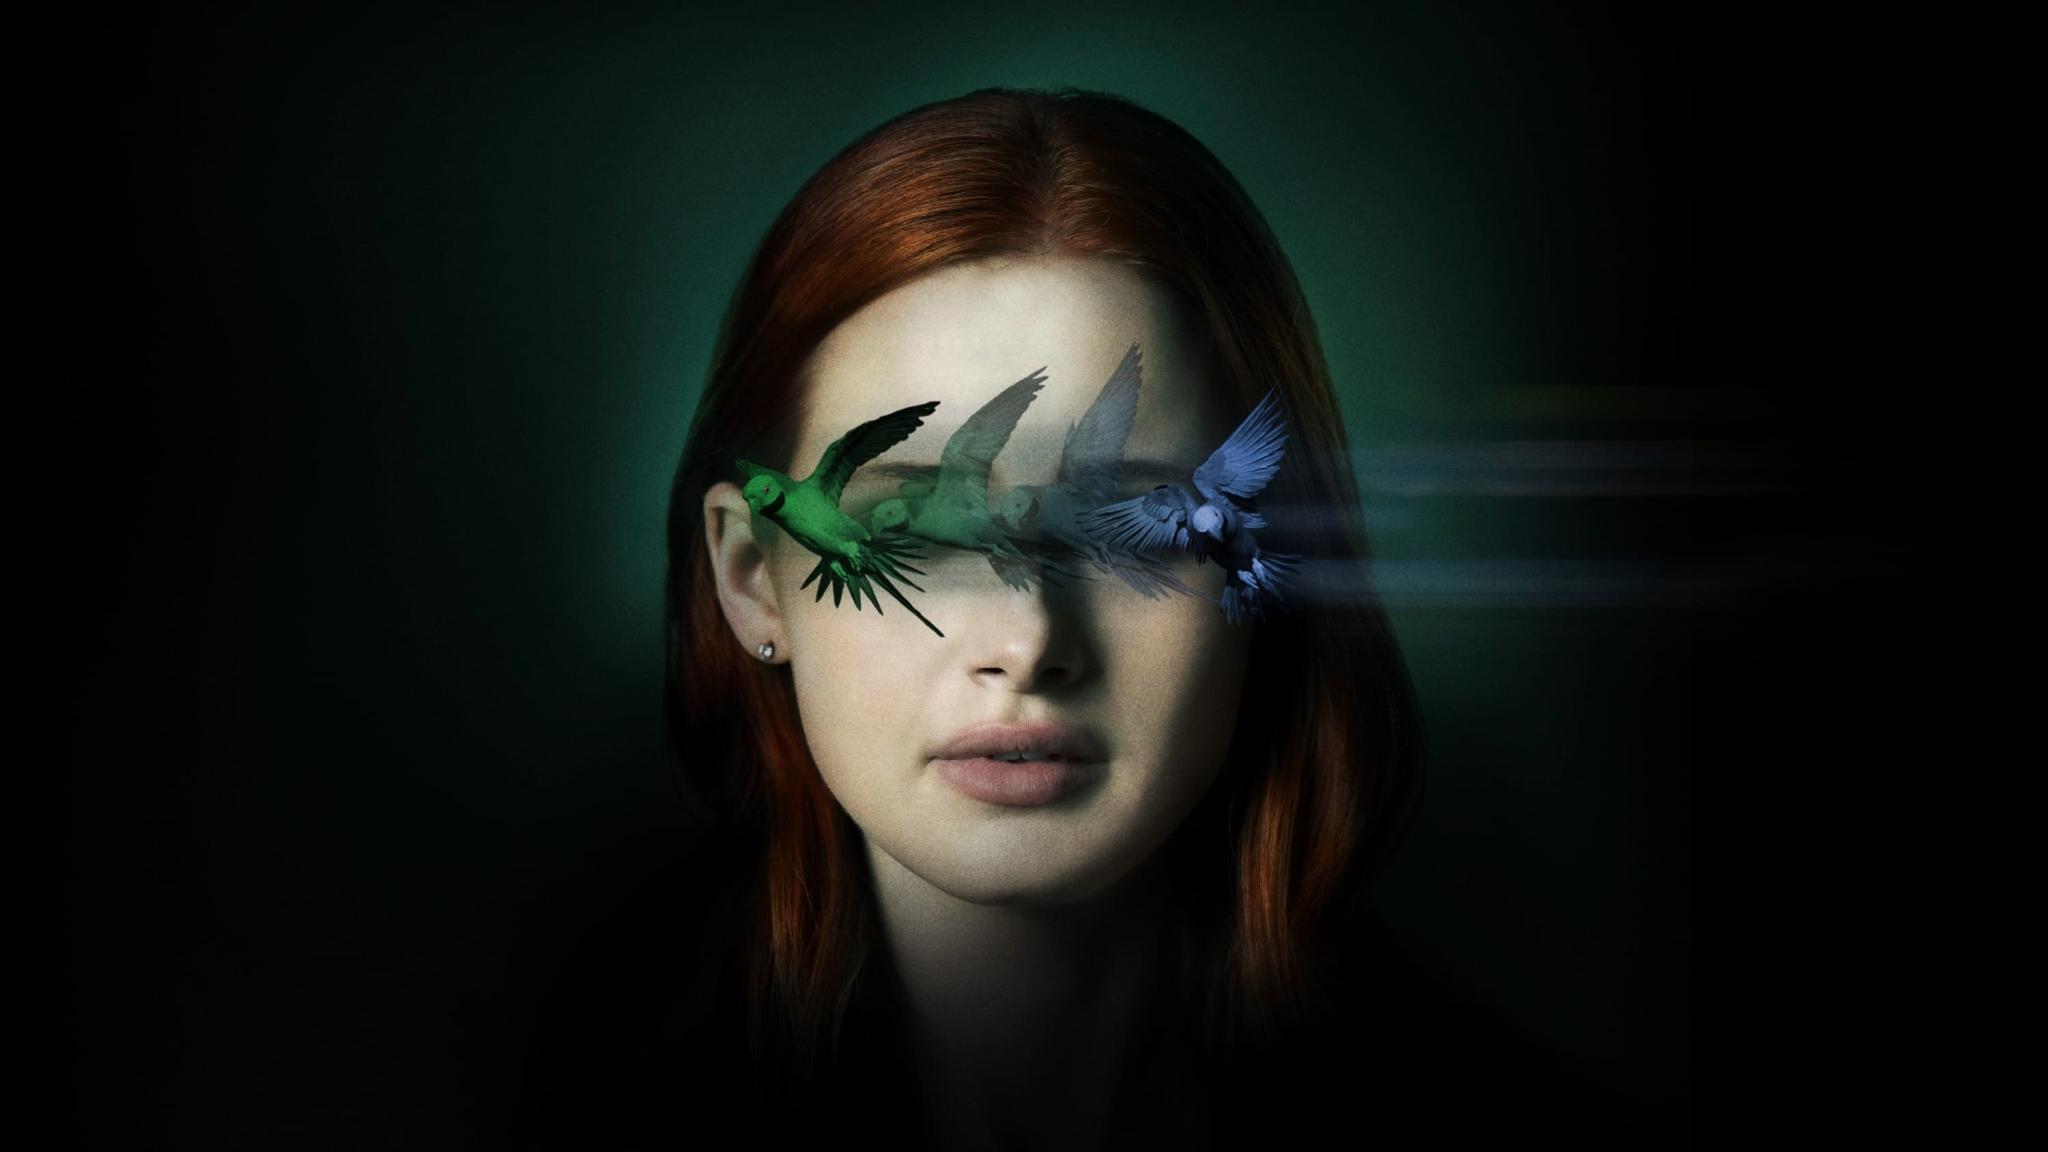 Madelaine Petsch Sightless Movie Wallpaper in 2048x1152 Resolution